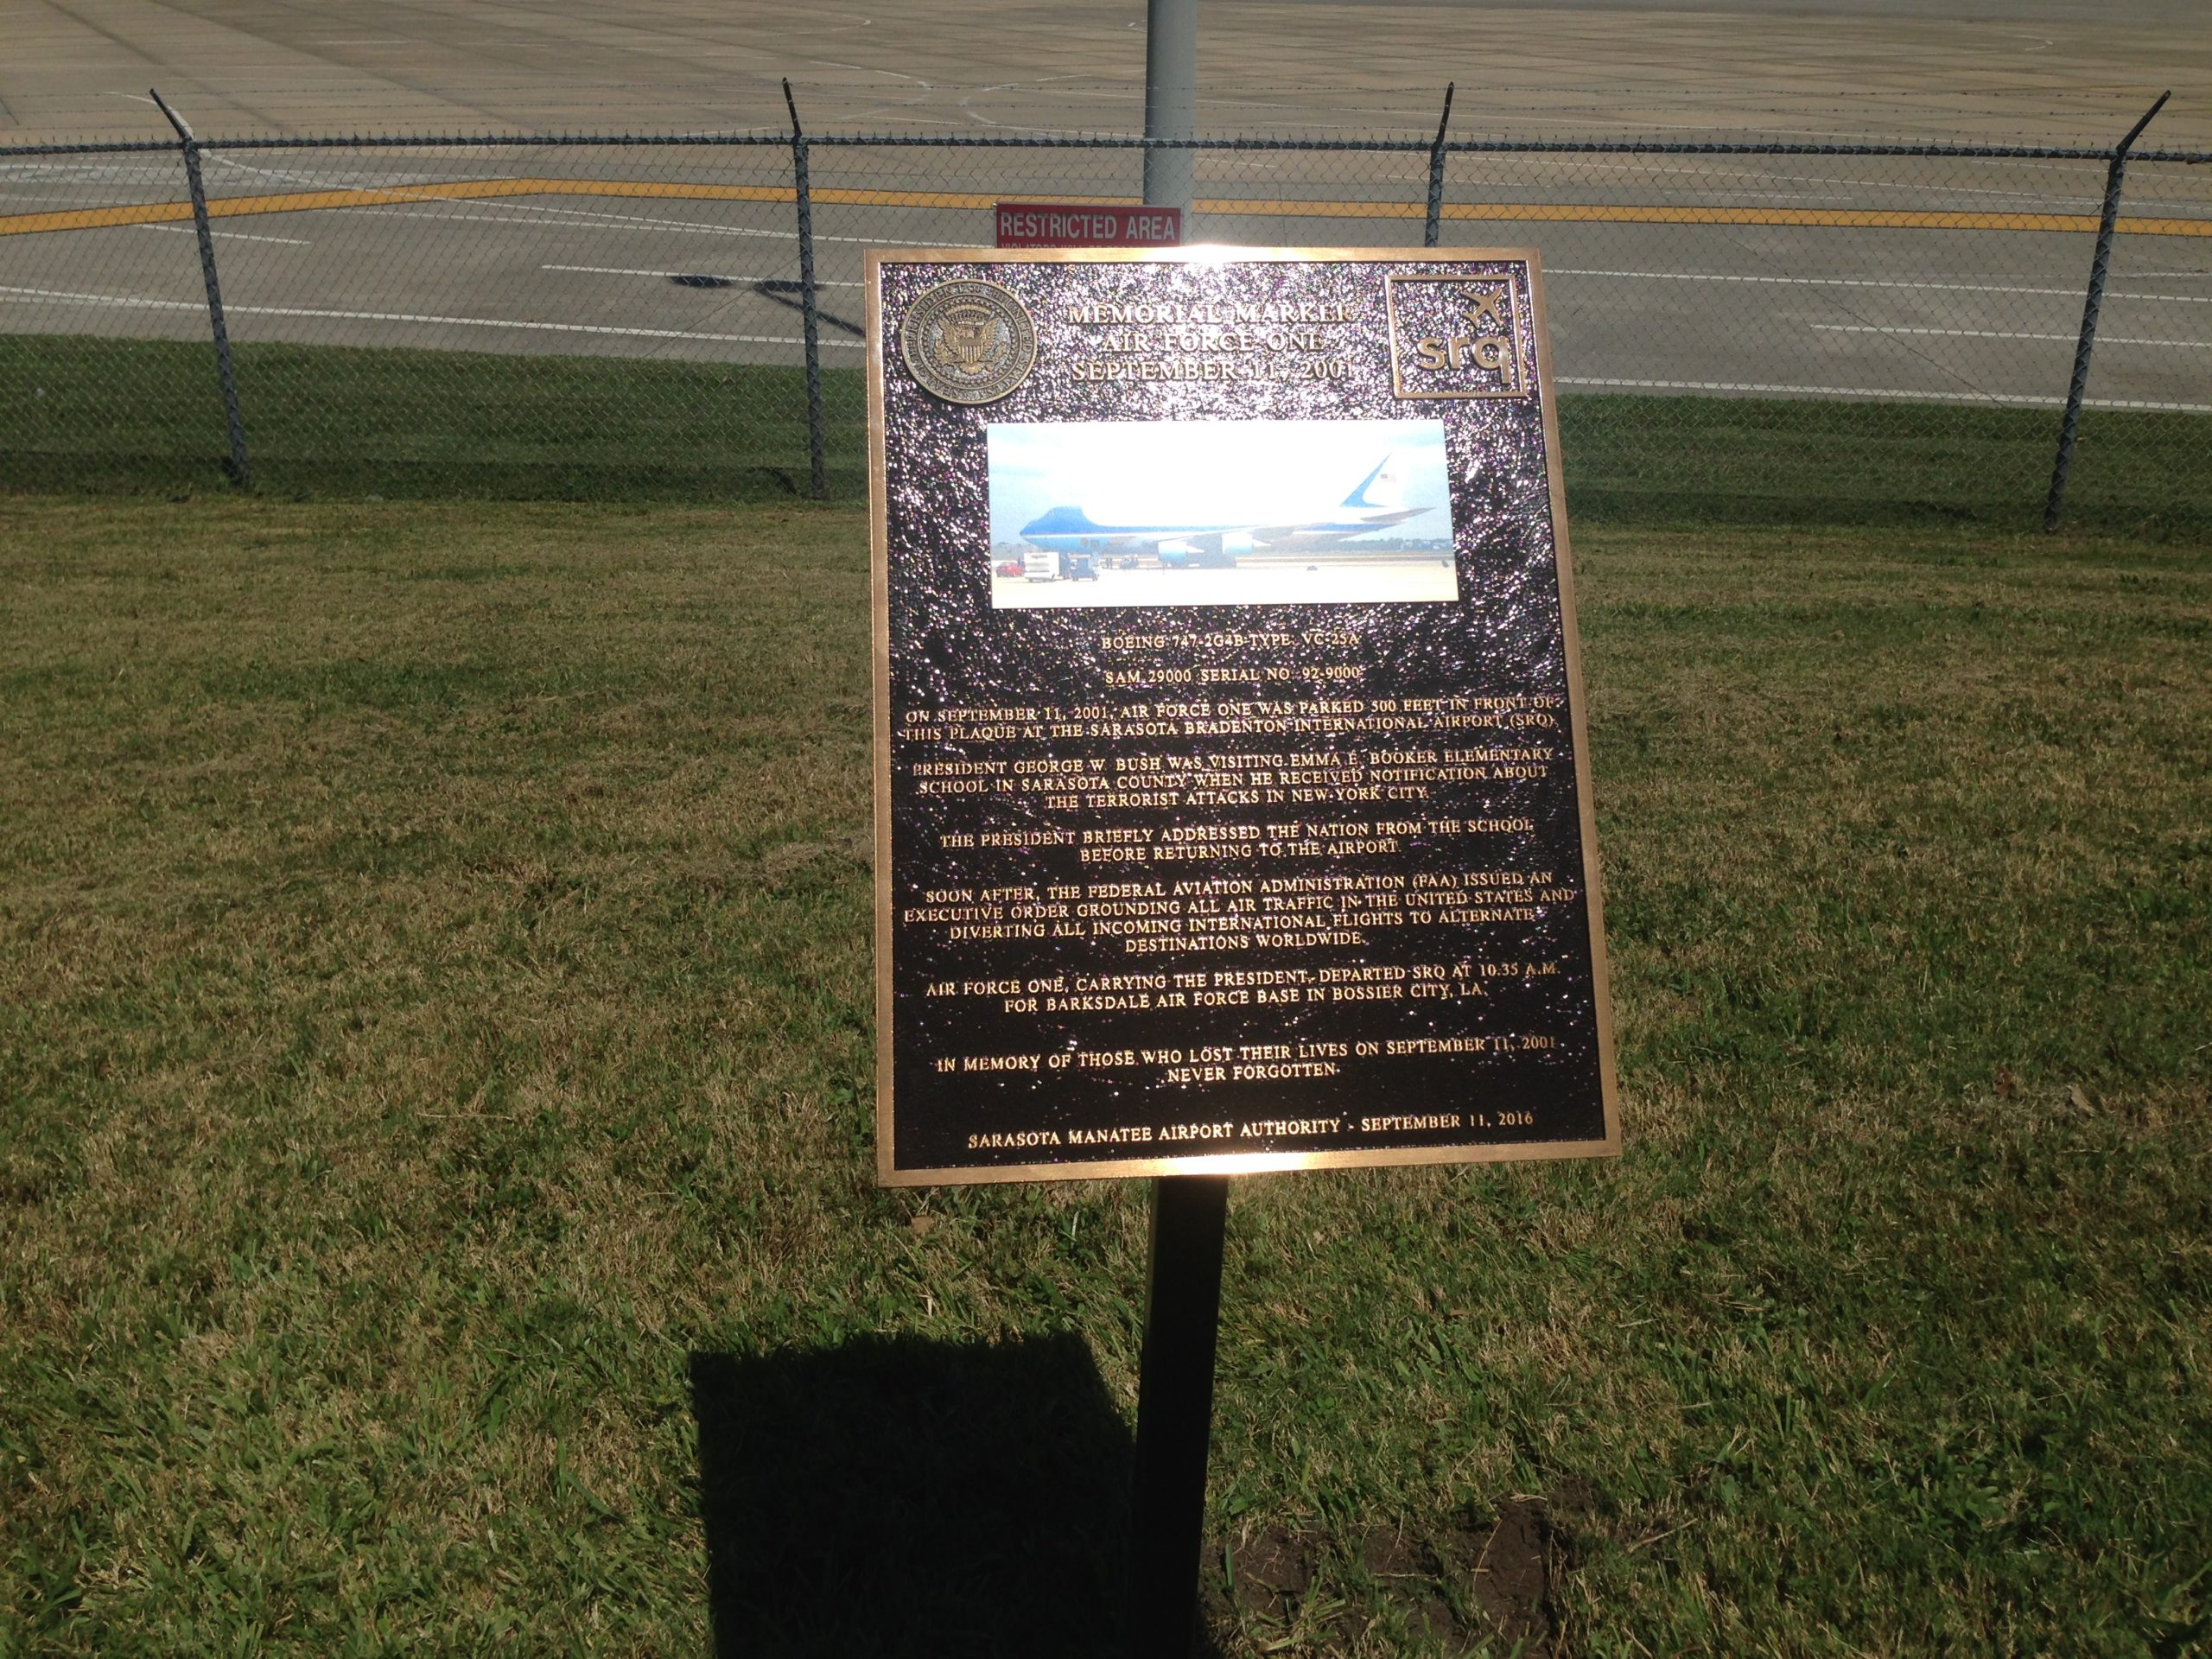 September 11, 2001 bronze plaque memorial Sarasota Airport